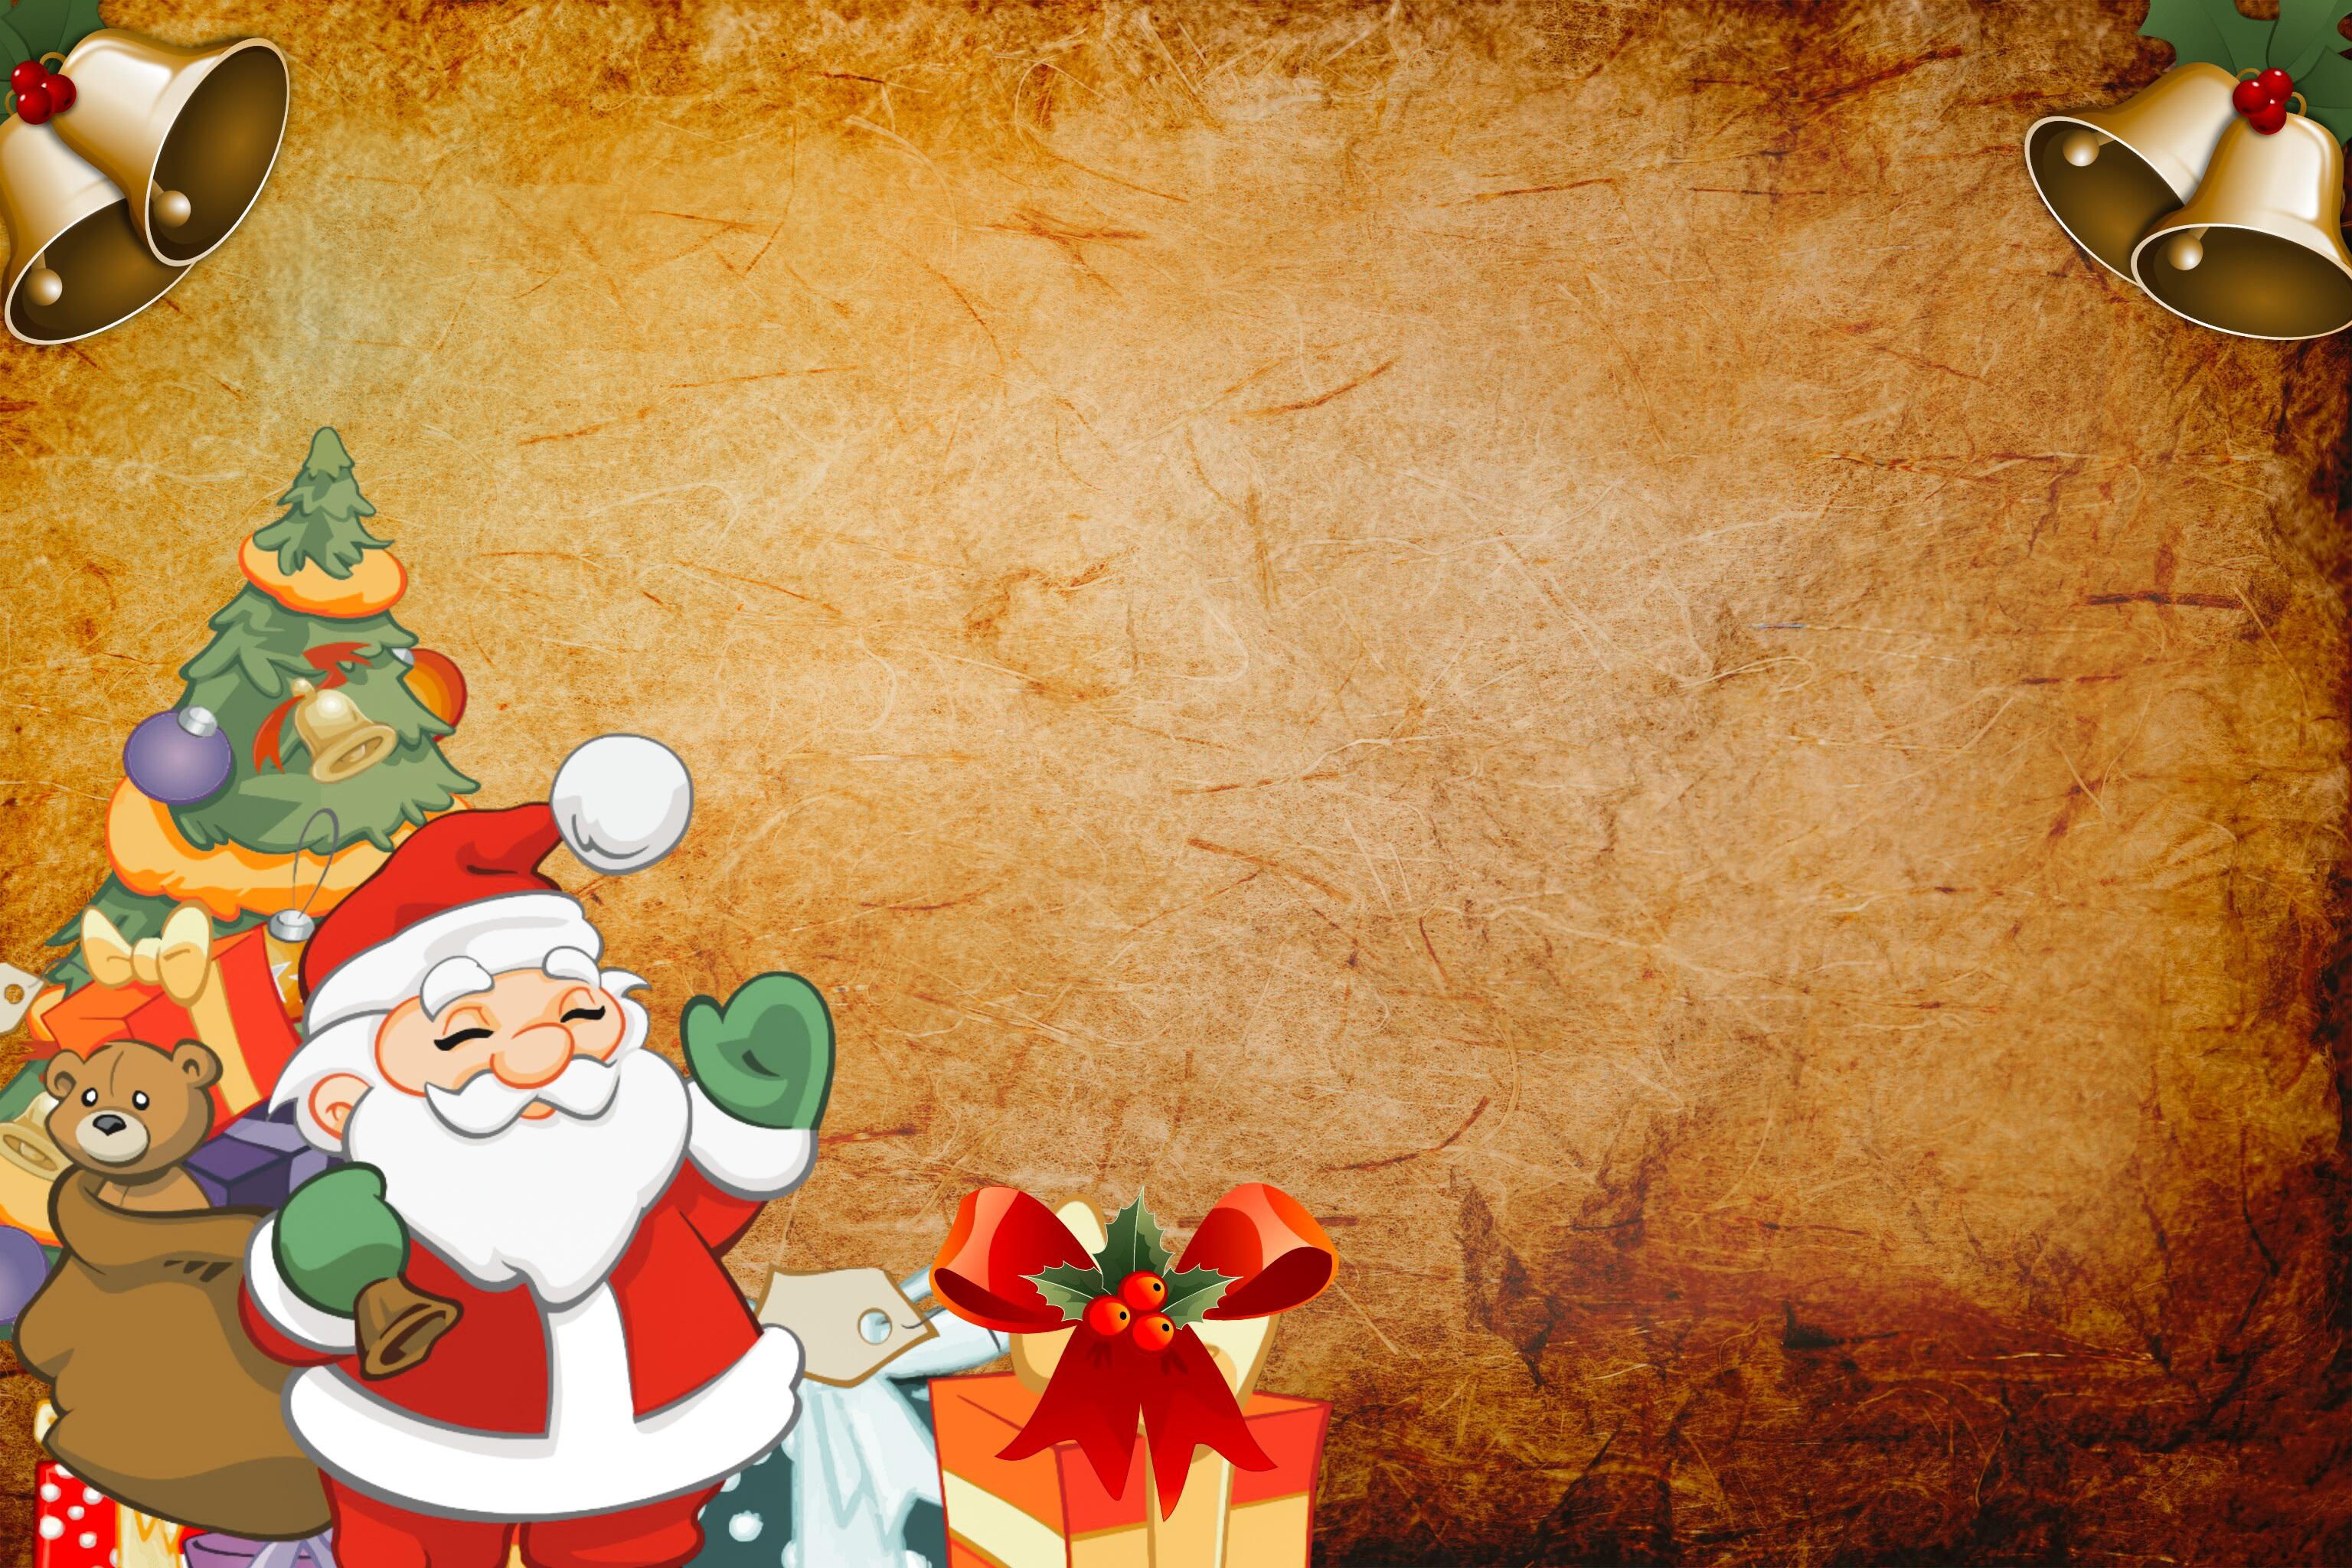 Gambar Santa Claus Latar Belakang Pohon Tahun Baru Hari